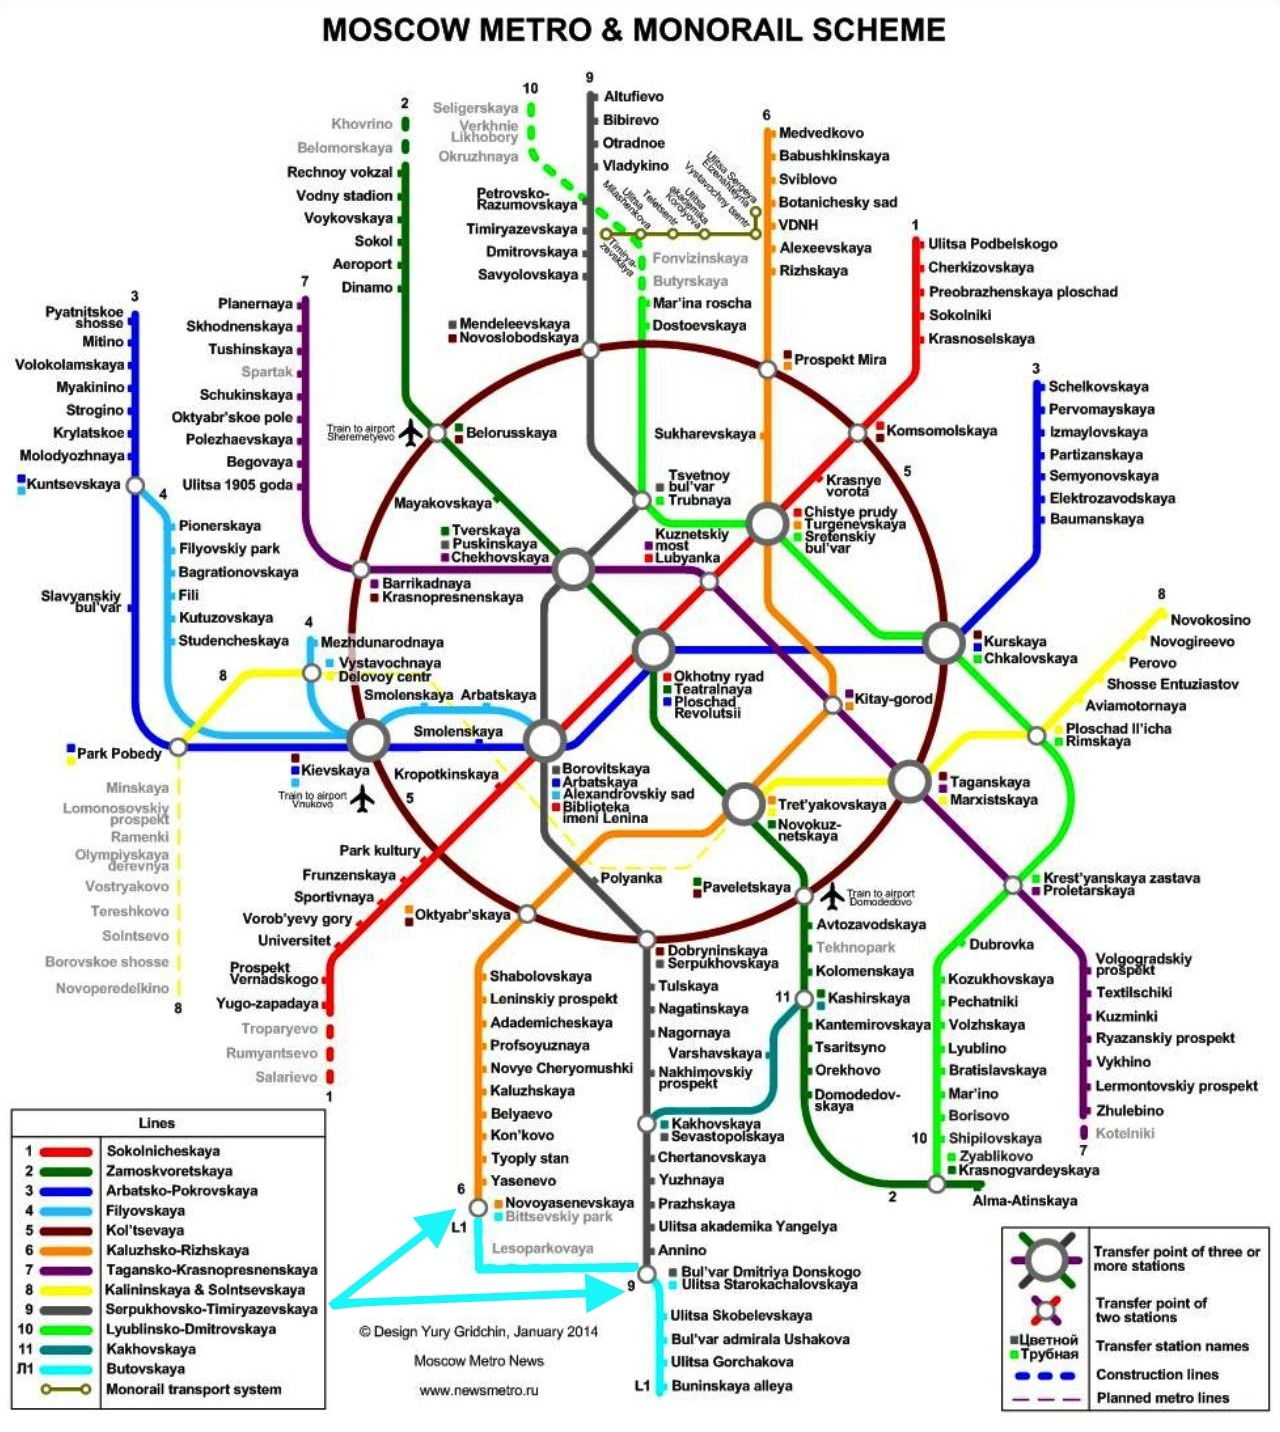 Трансы москва метро динамо 19 фотография